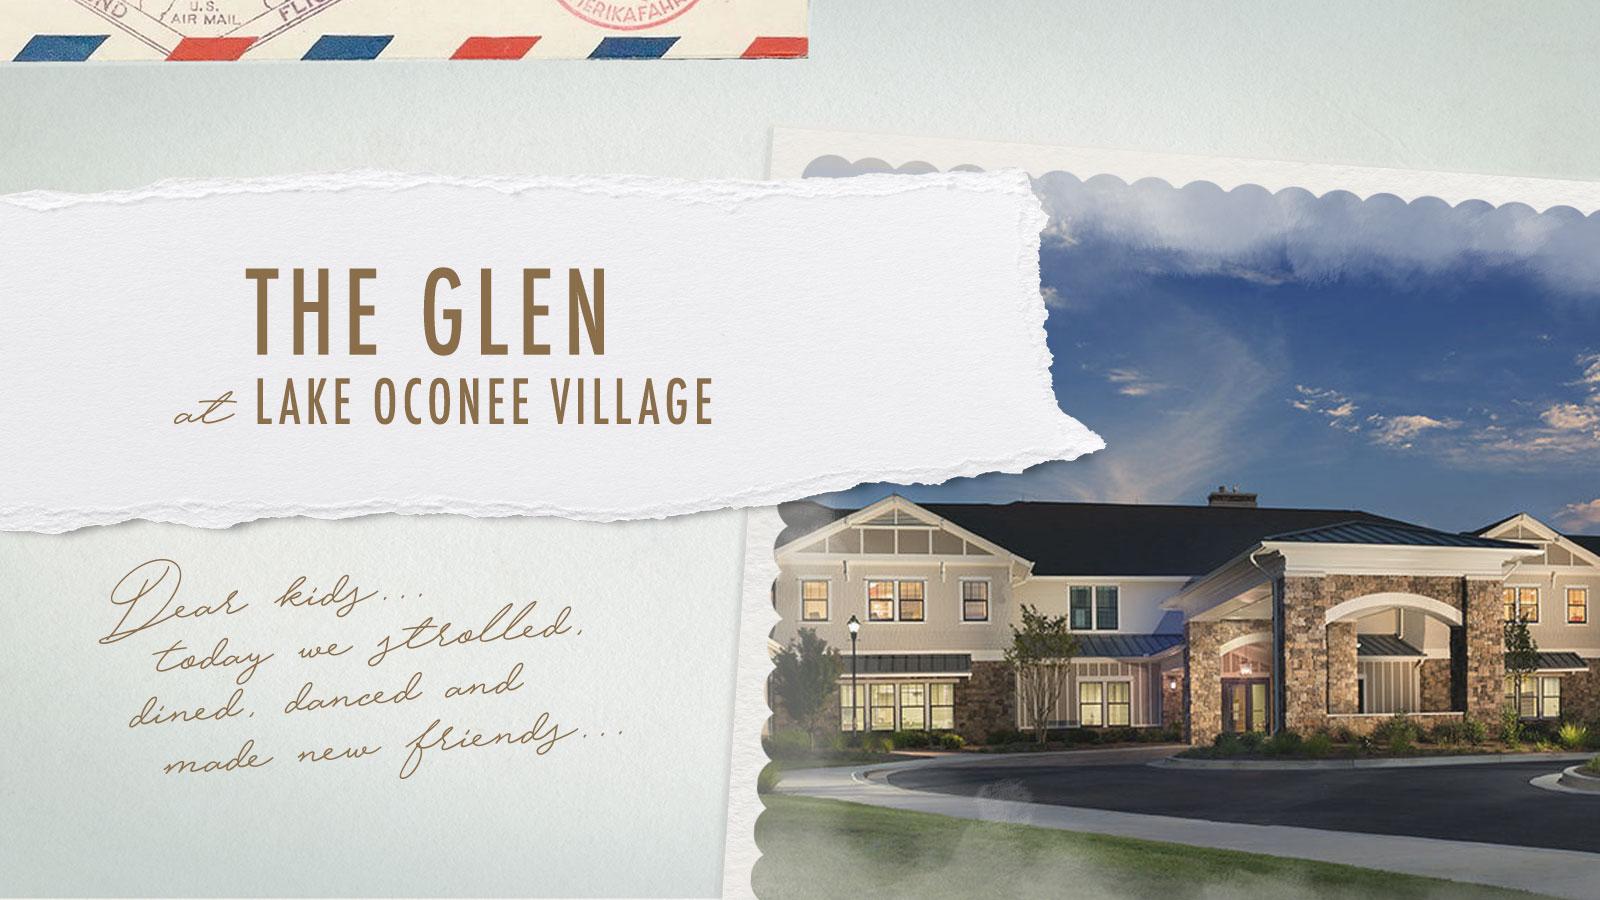 The Glen at Lake Oconee Village